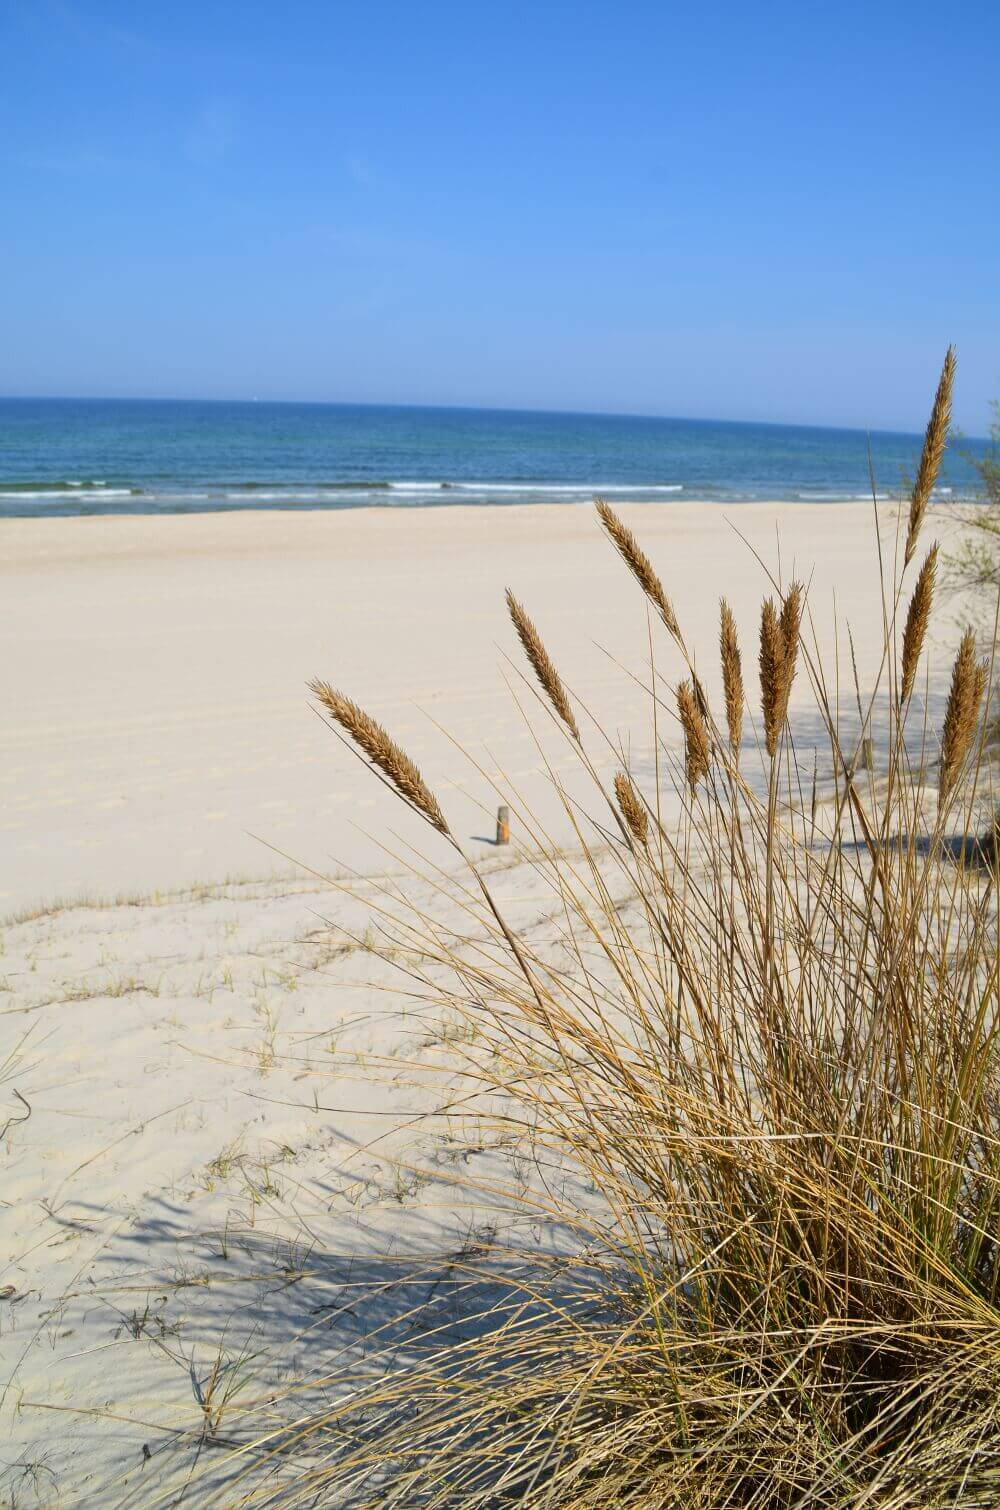 Trassenheider Strand